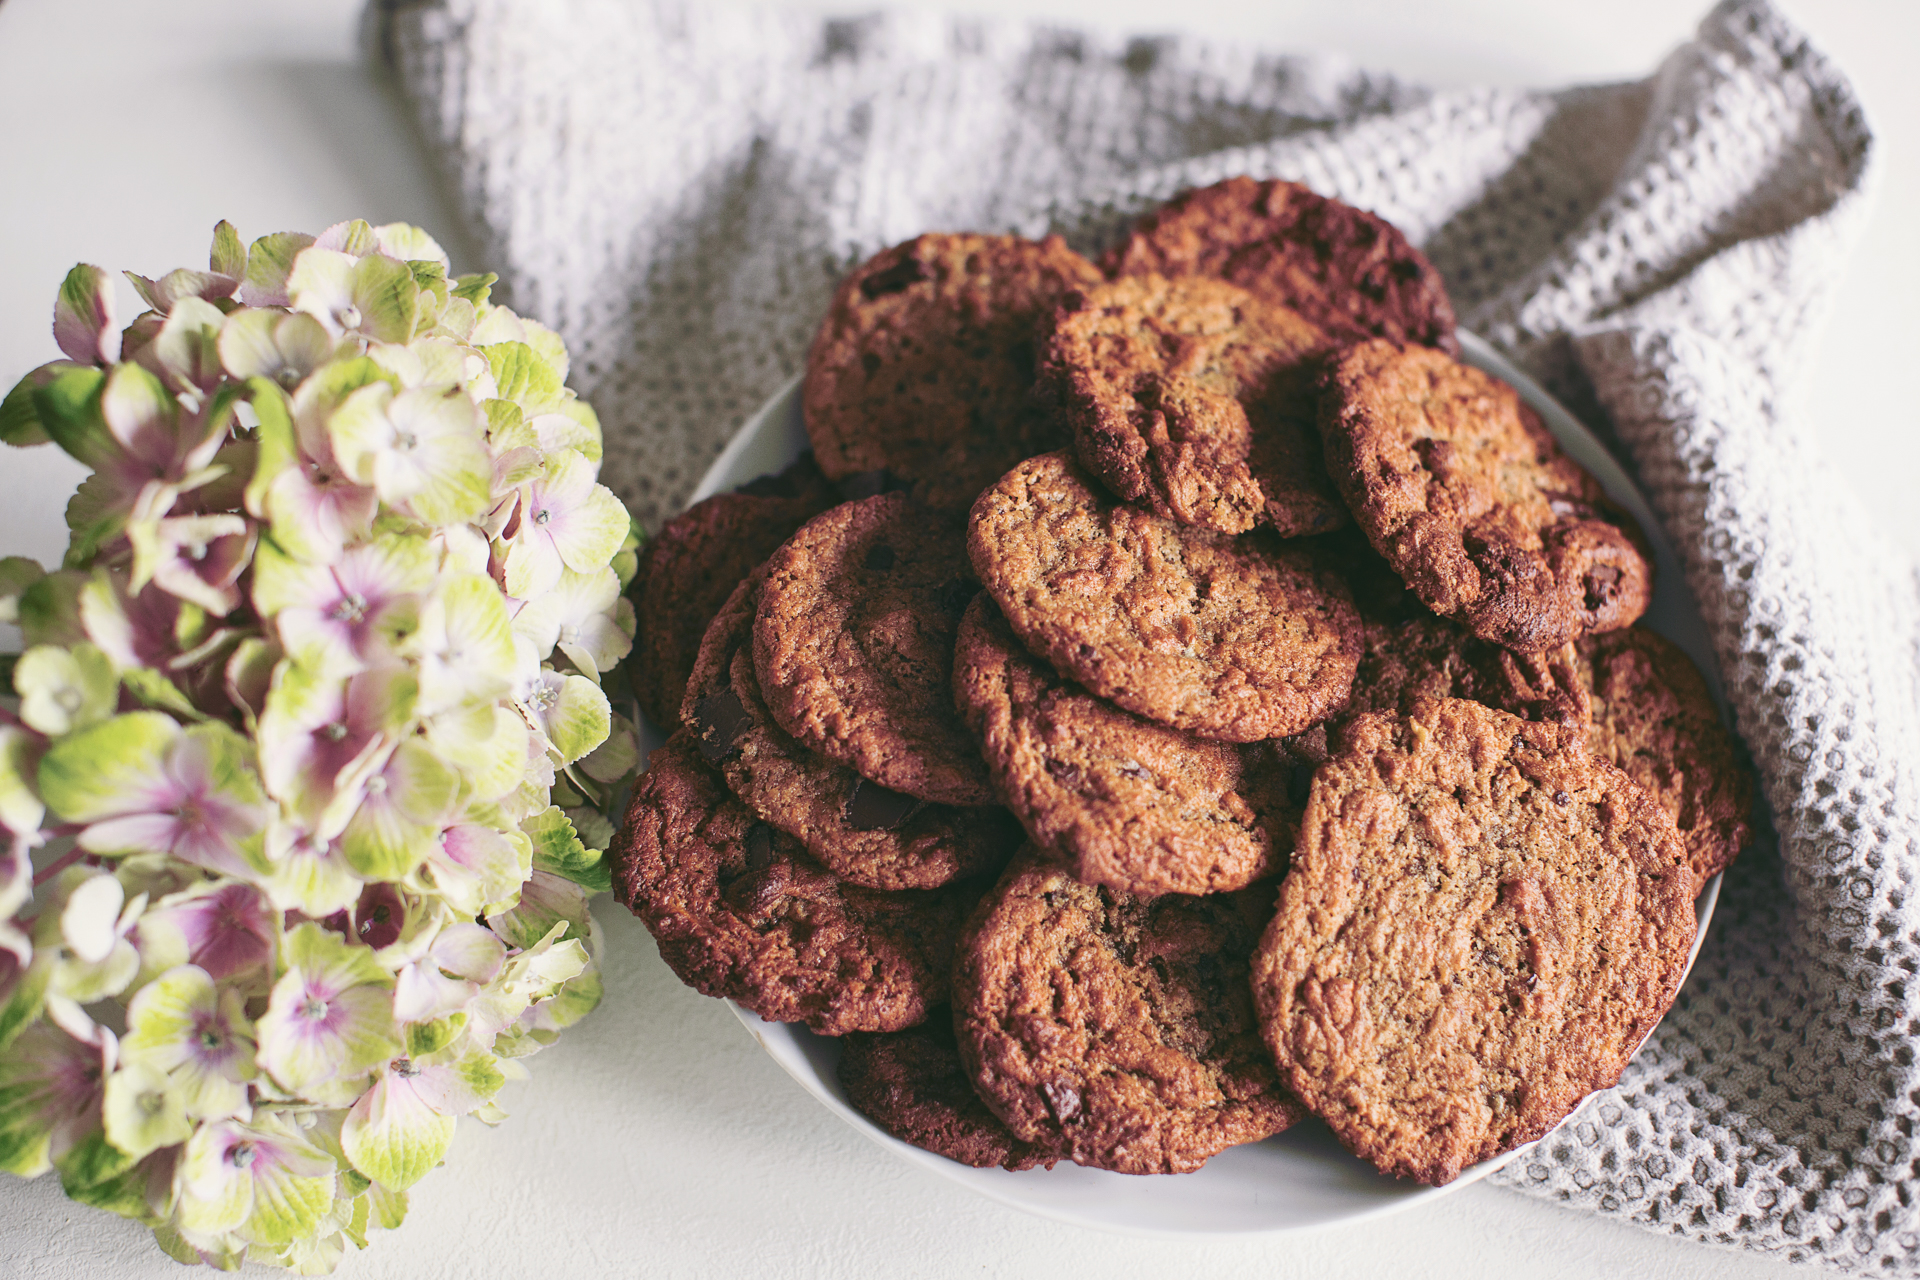 The wonderful peanut butter cookies